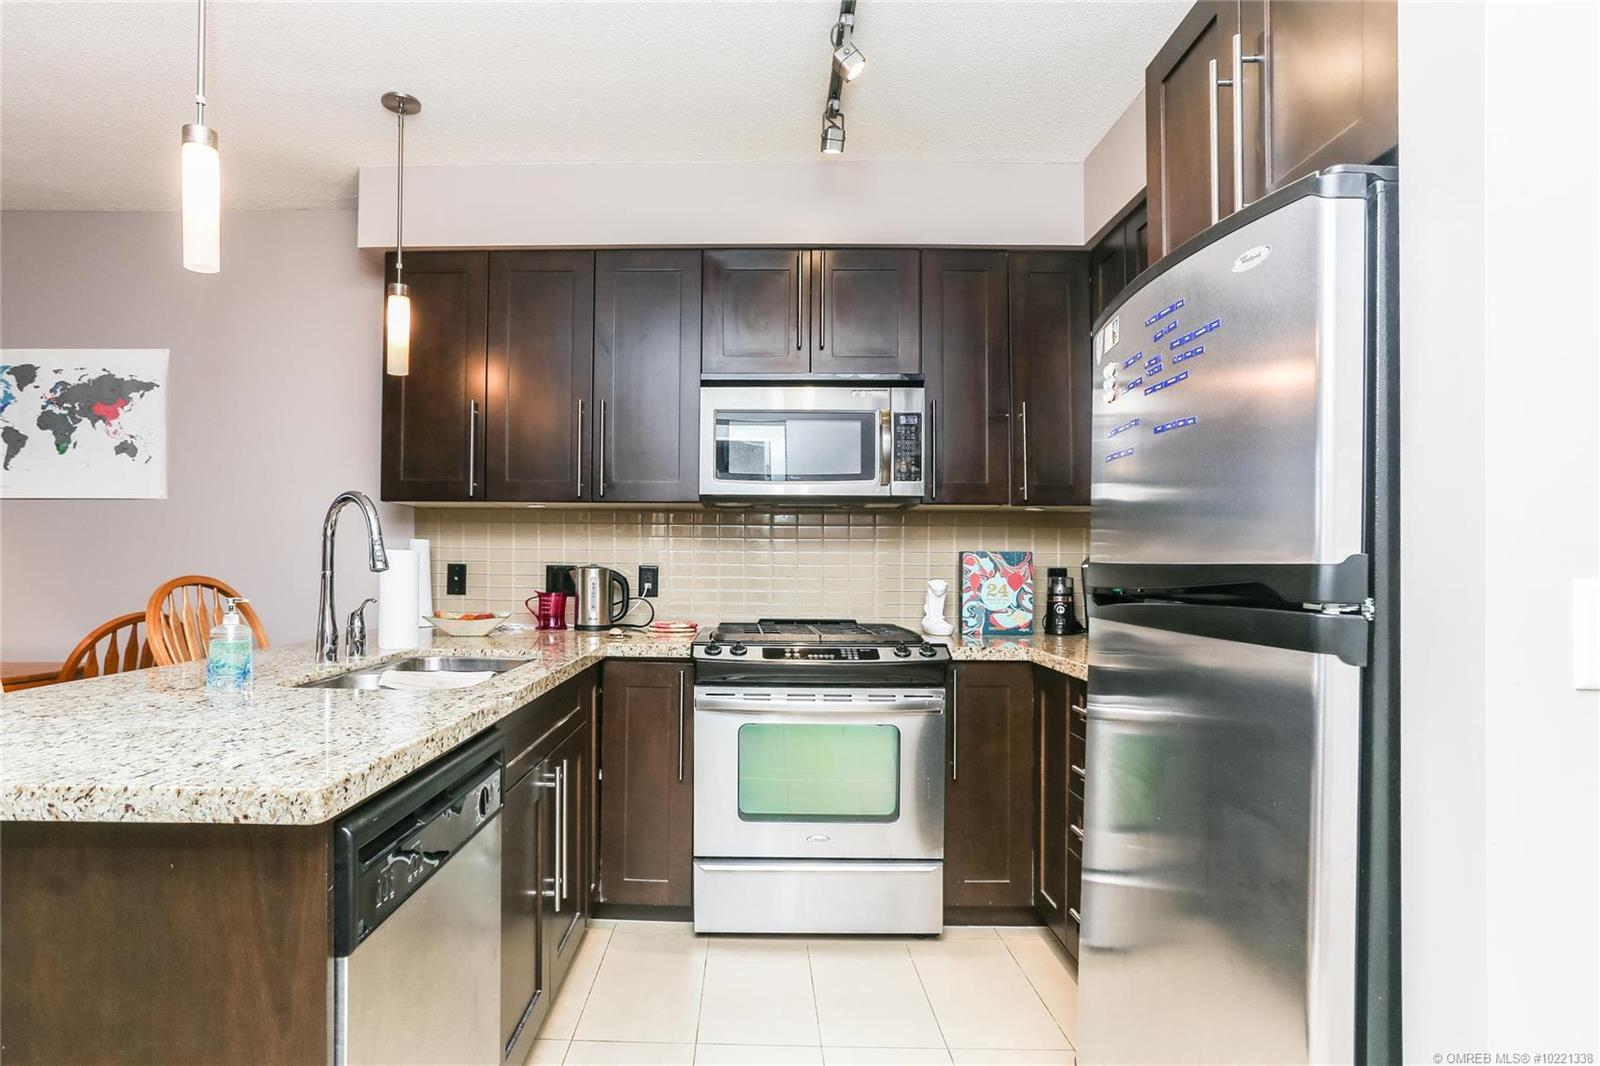 #404 1075 Sunset Drive, - Kelowna Apartment for sale, 1 Bedroom (10221338) - #4